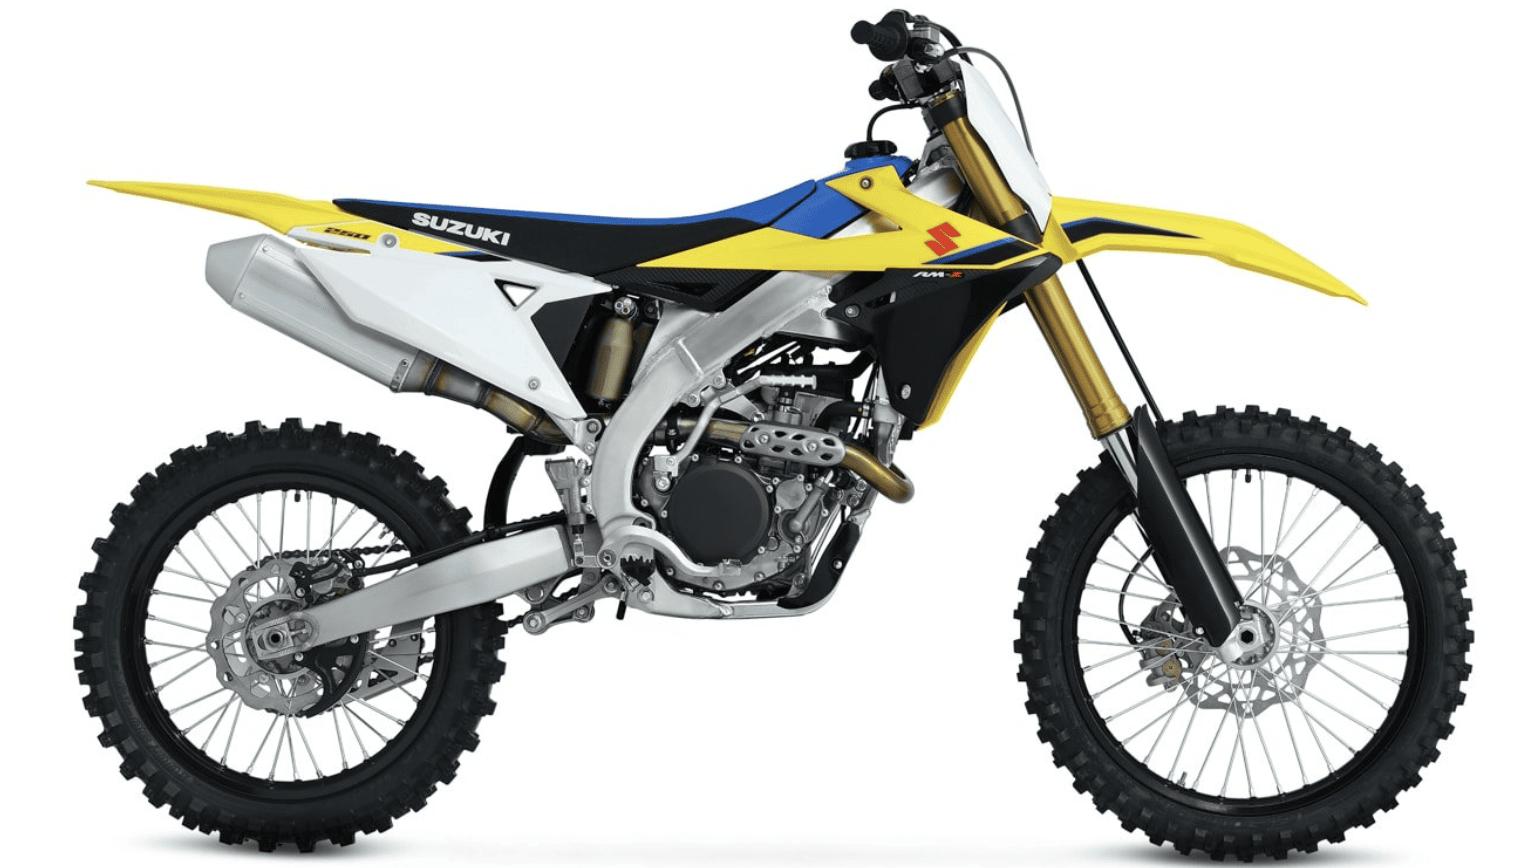 2020 Adult Suzuki Motocross dirt bike